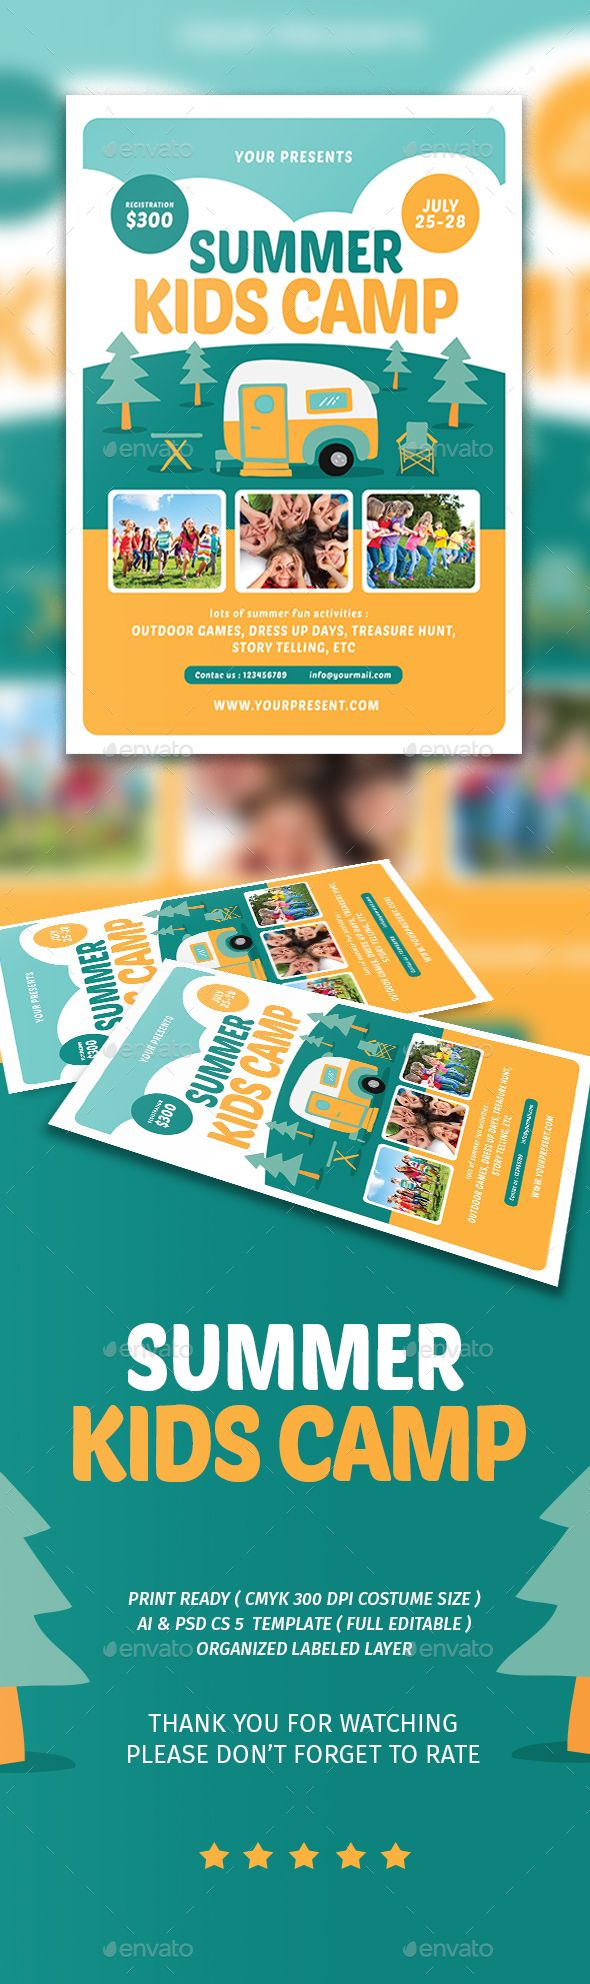 sunday brunch event flyer poster template brunch summer kids camp